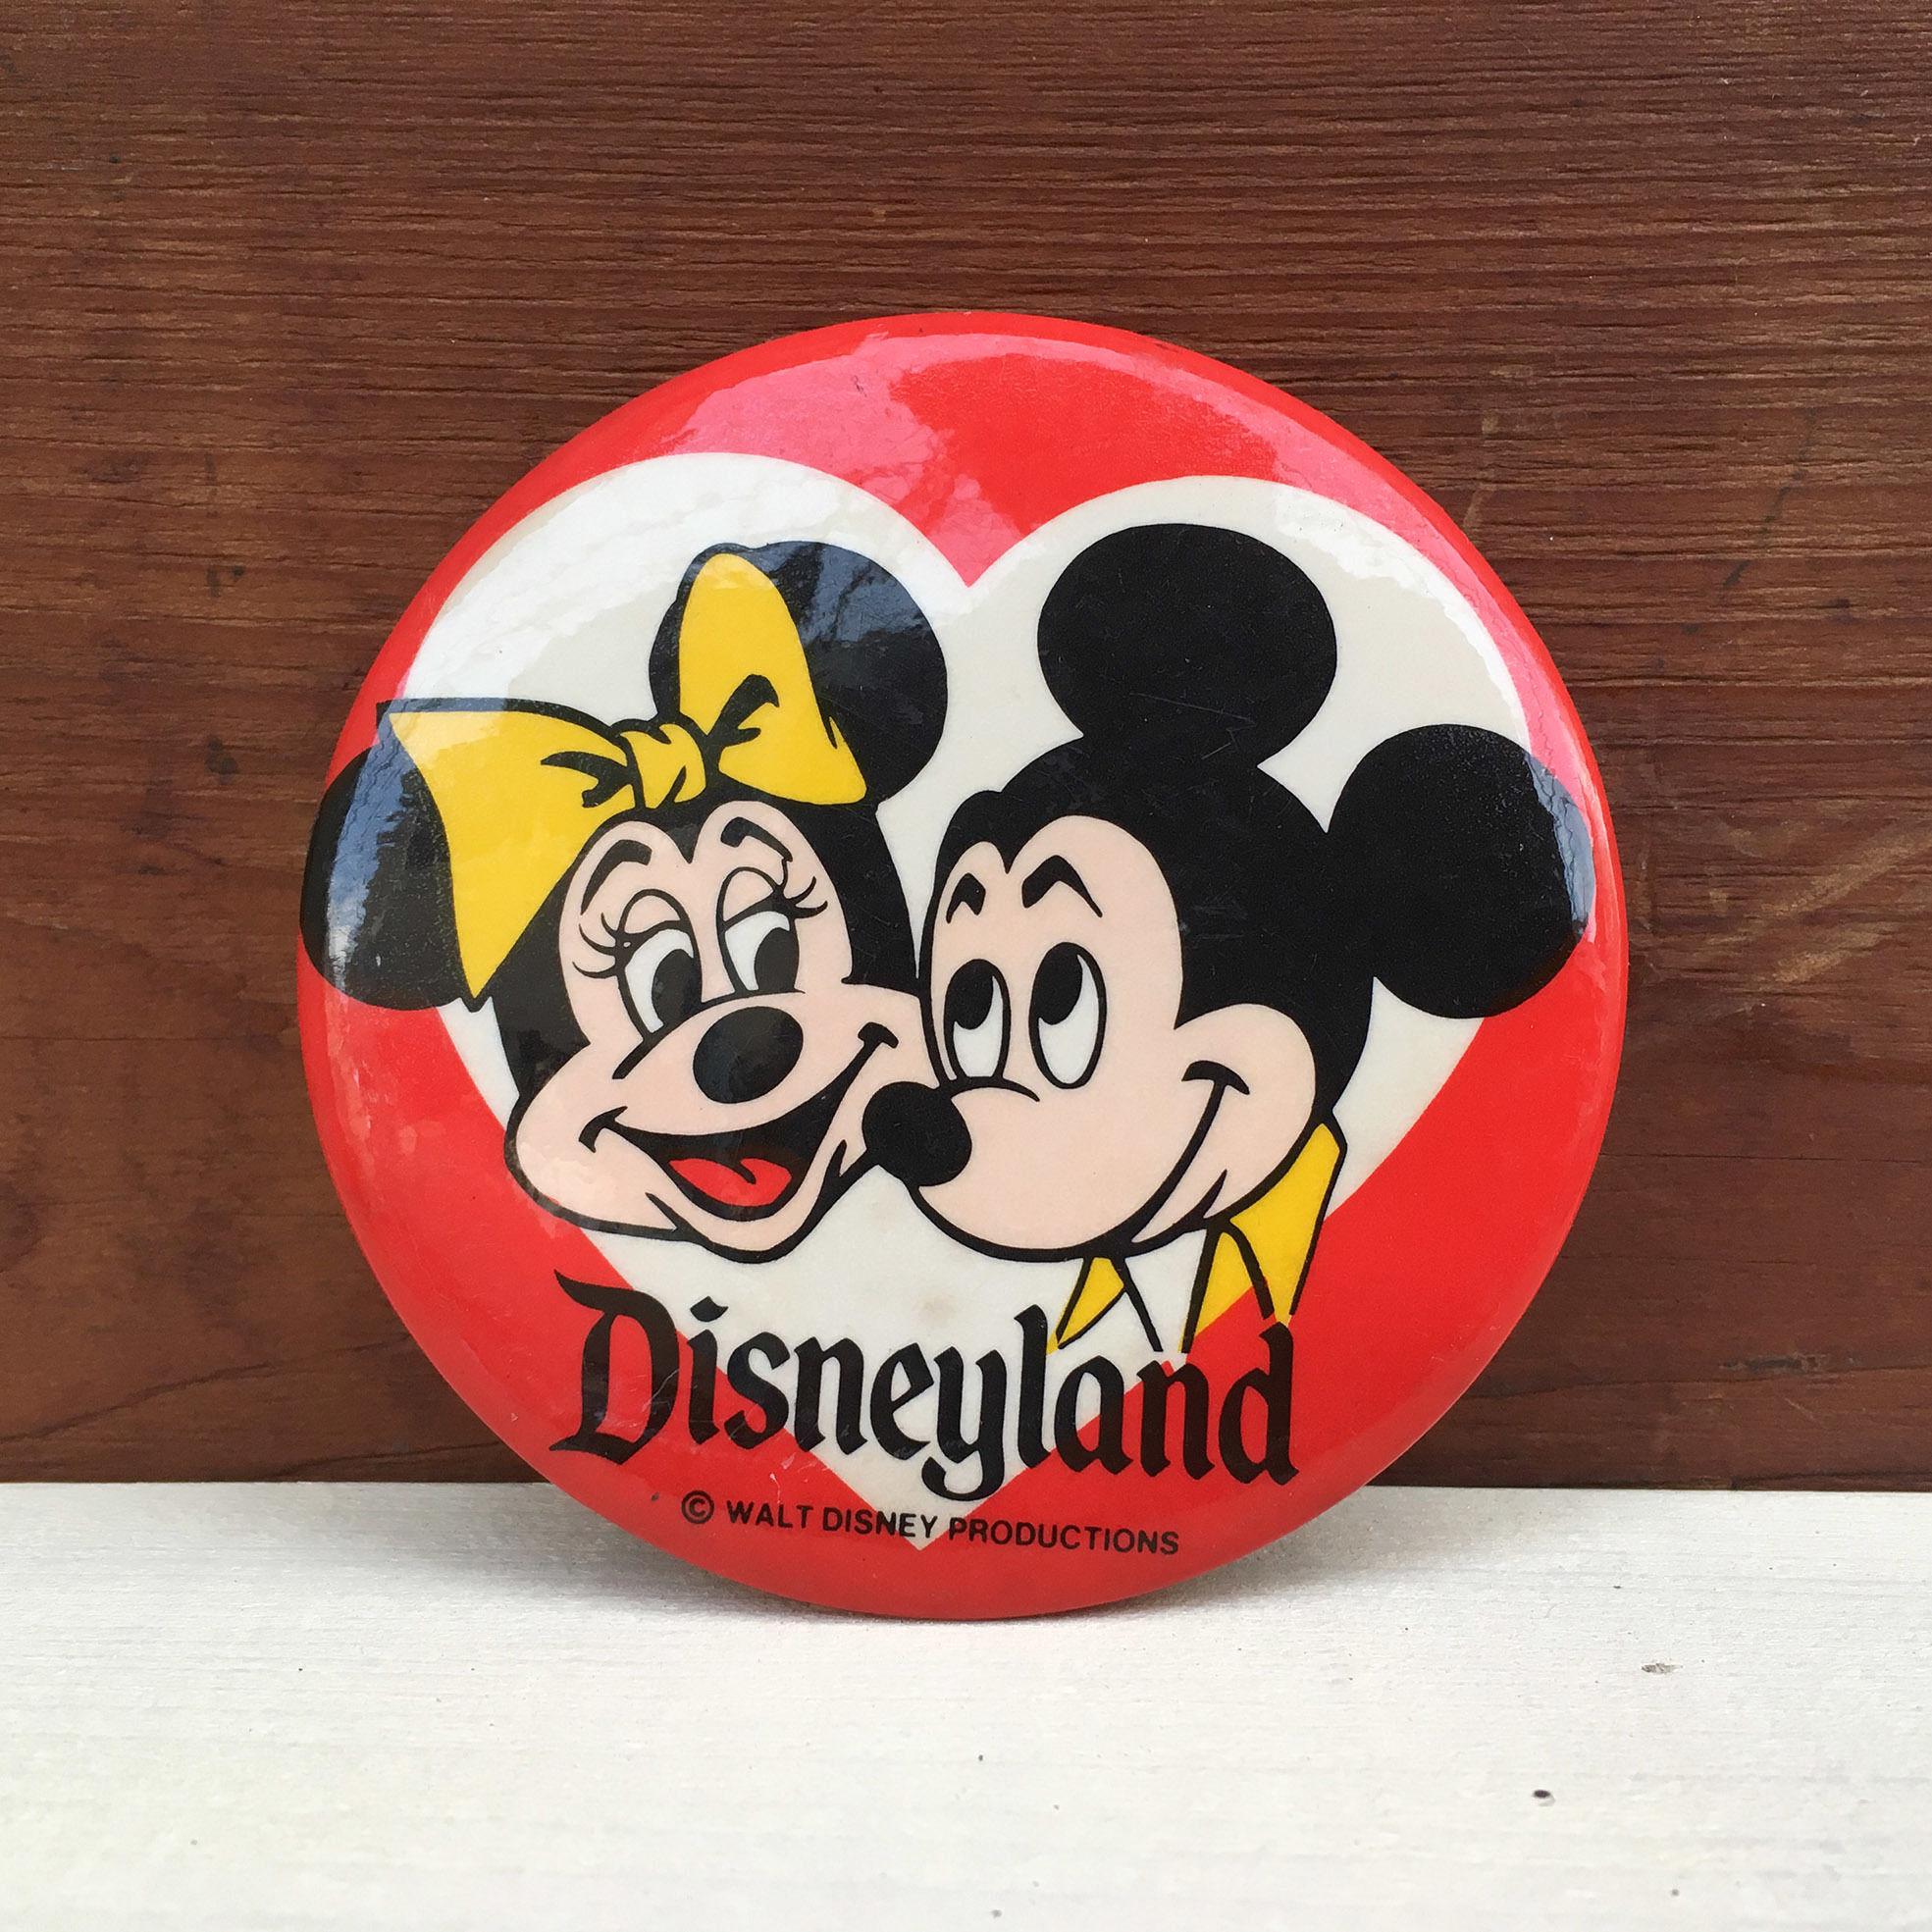 Disney Disneyland Button/ディズニー ディズニーランド 缶バッジ/171215-5